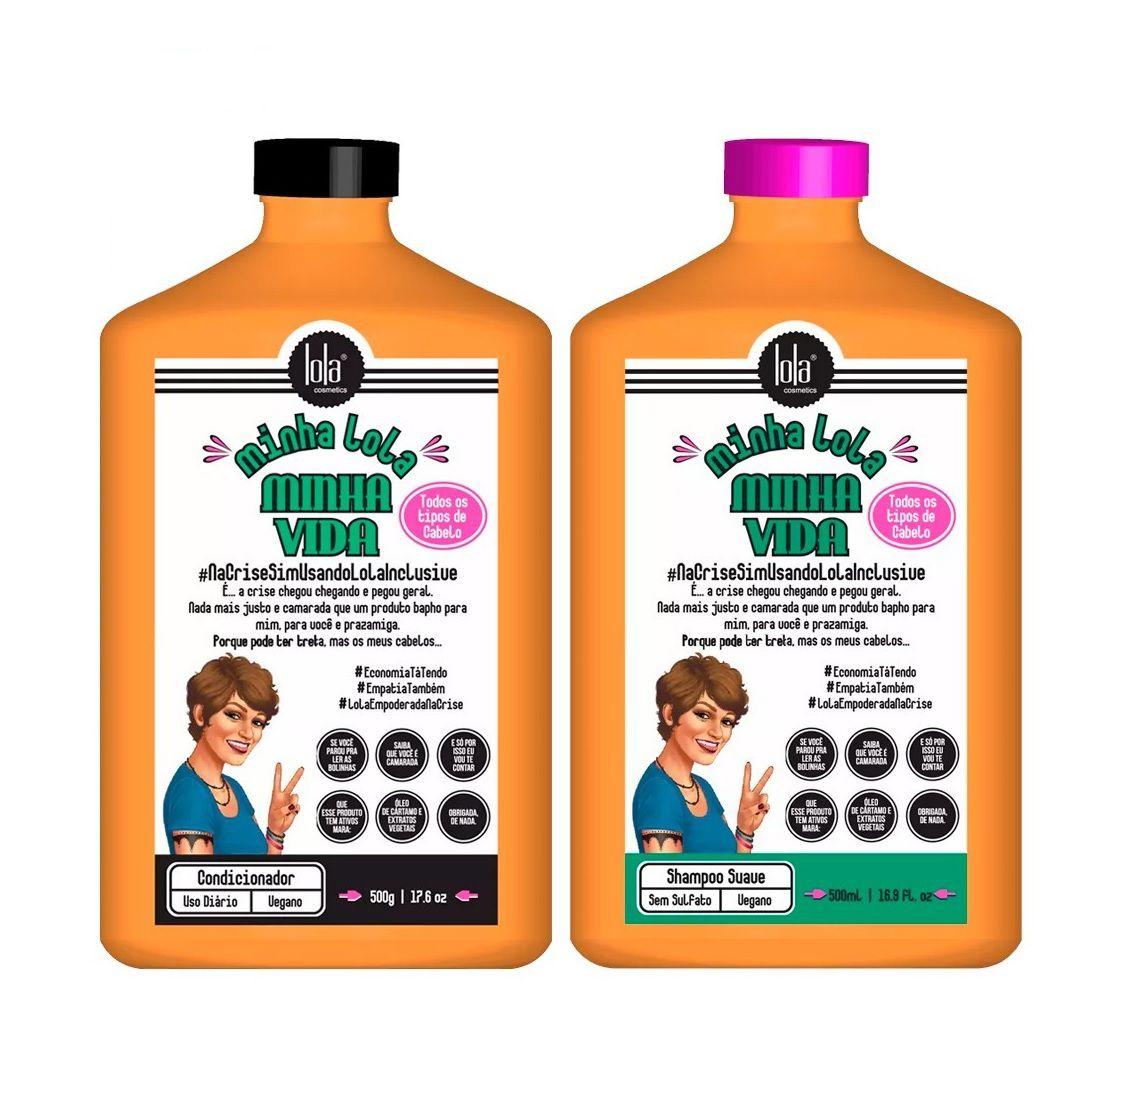 Lola Minha Lola  Minha Vida Kit Shampoo e Condicionador - 2x500ml